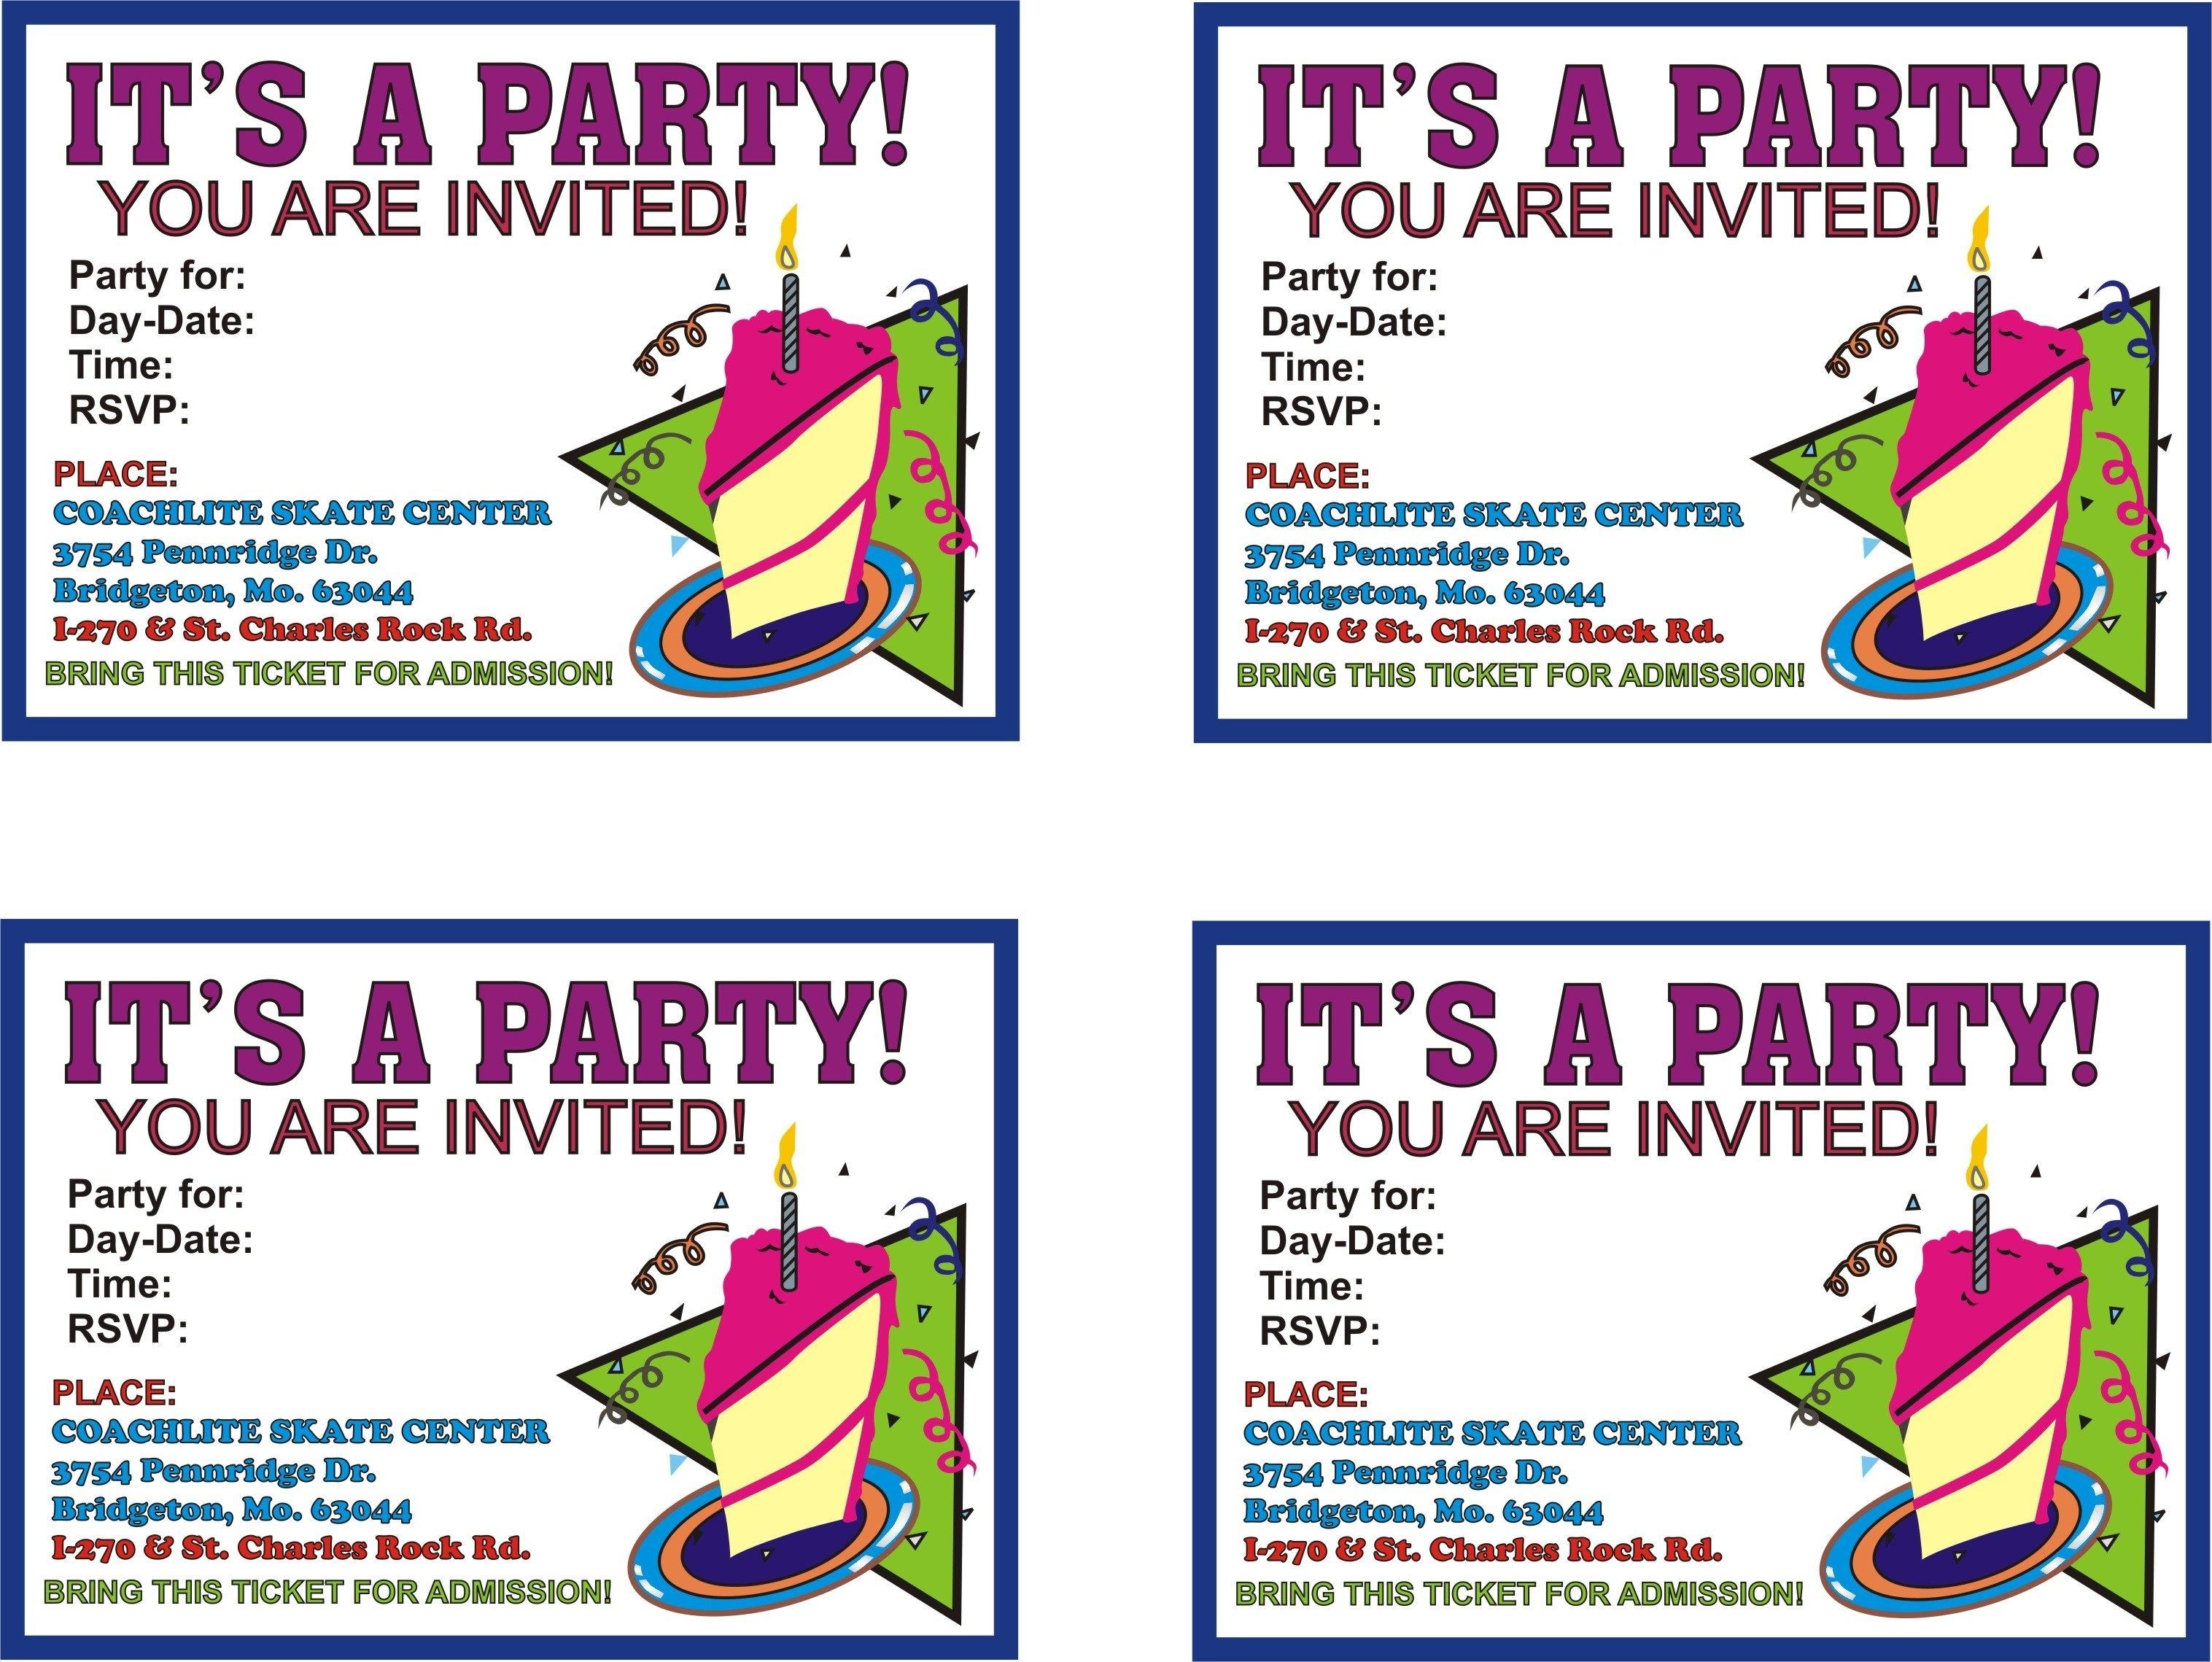 002 Template Ideas Birthday Invitation Templates Free Printable - Make Printable Party Invitations Online Free